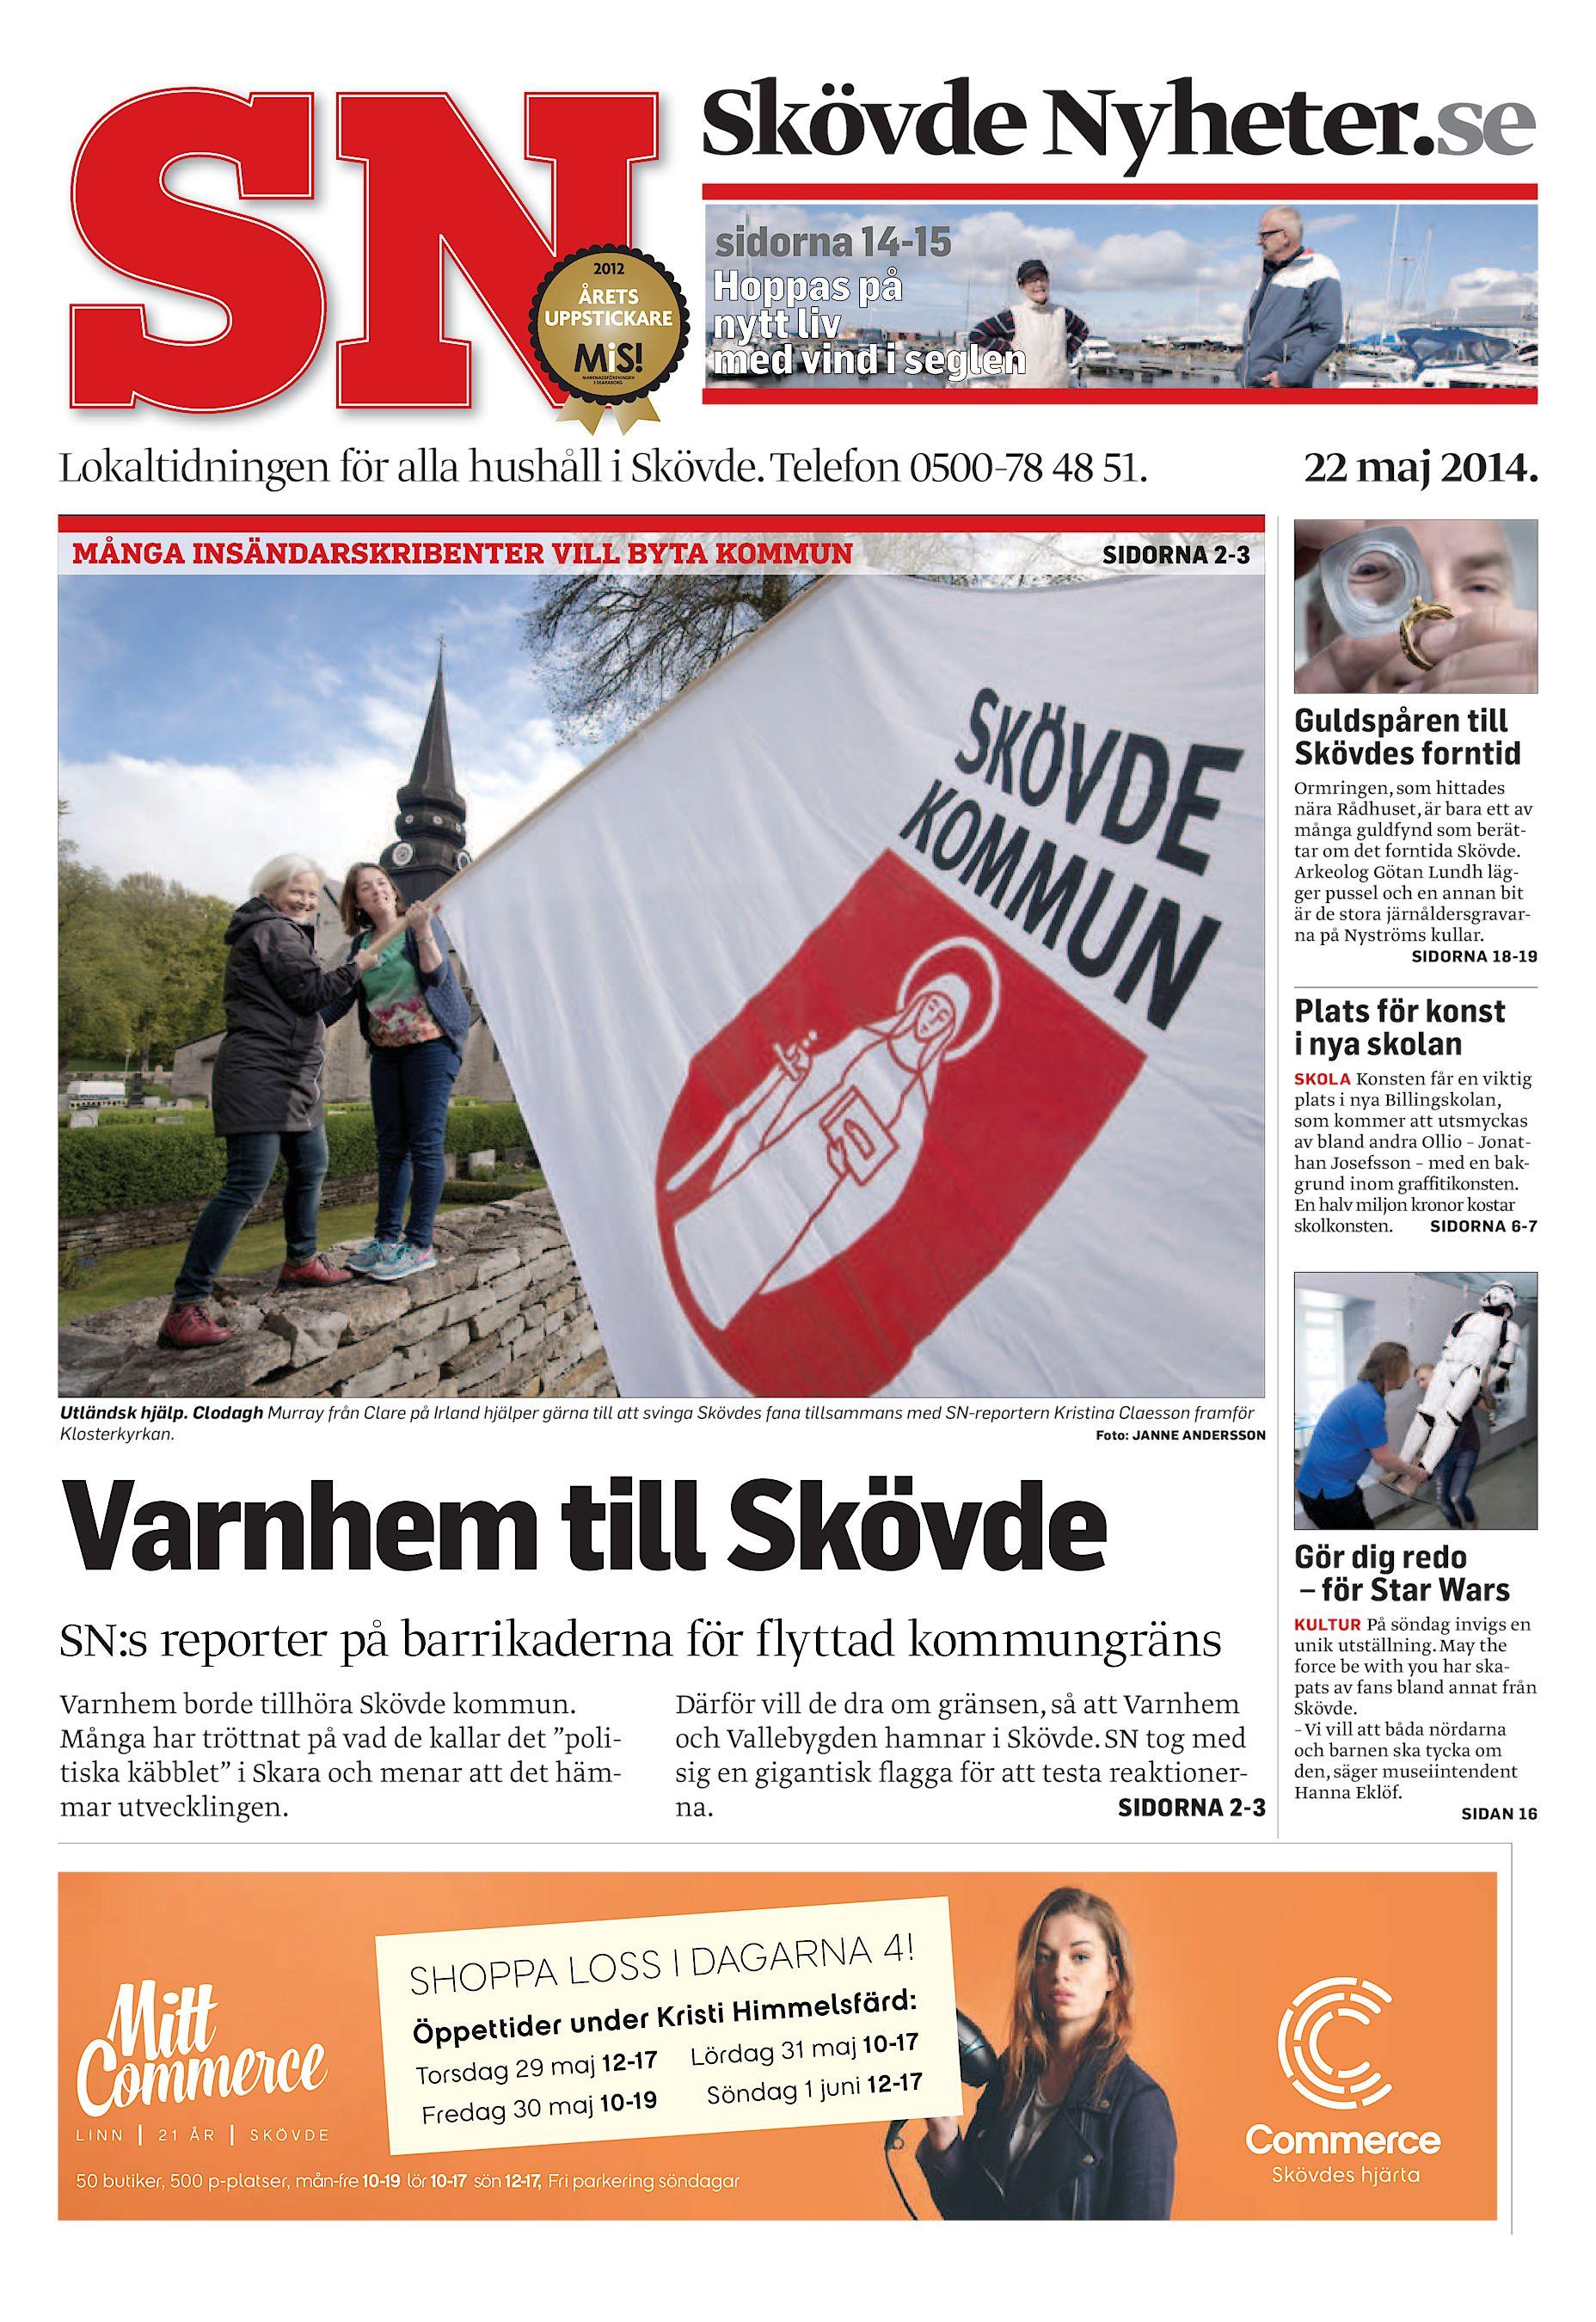 c8e269a4fd3 Skövde Nyheter SN-20140522 (endast text)